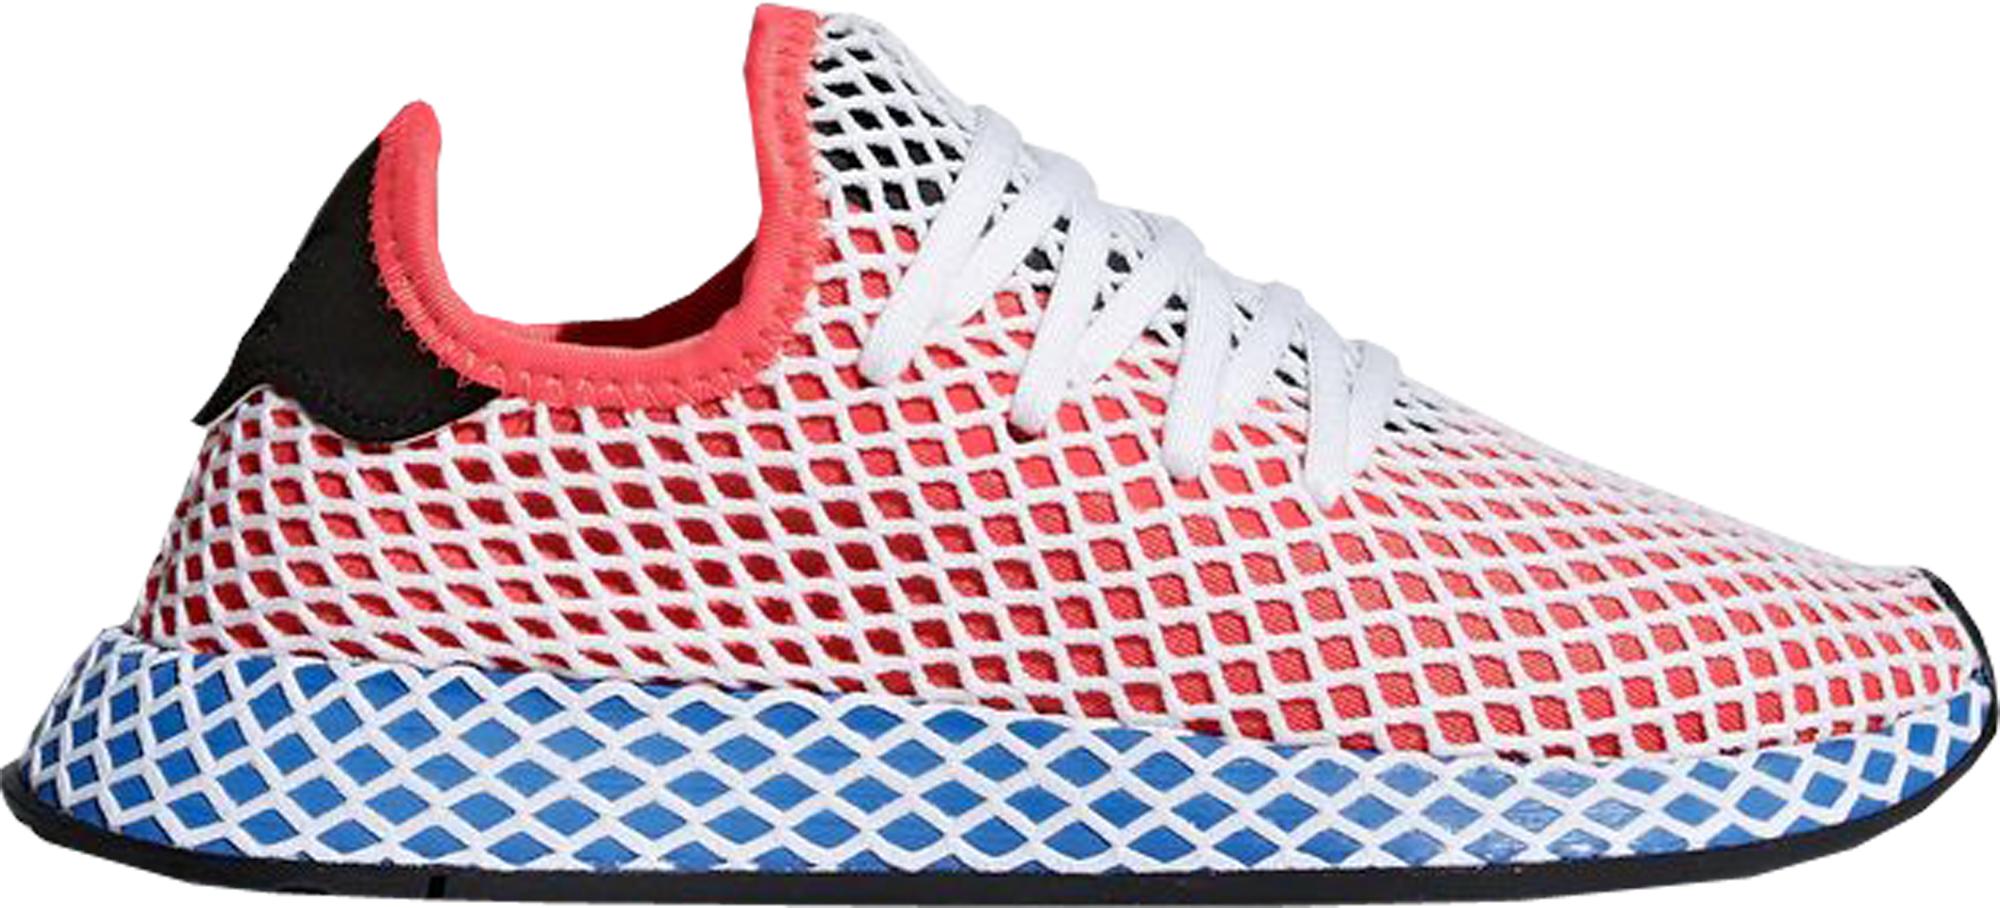 Adidas Originals Adidas Deerupt Solar Red Bluebird (youth) In Solar Red/solar Red/bluebird